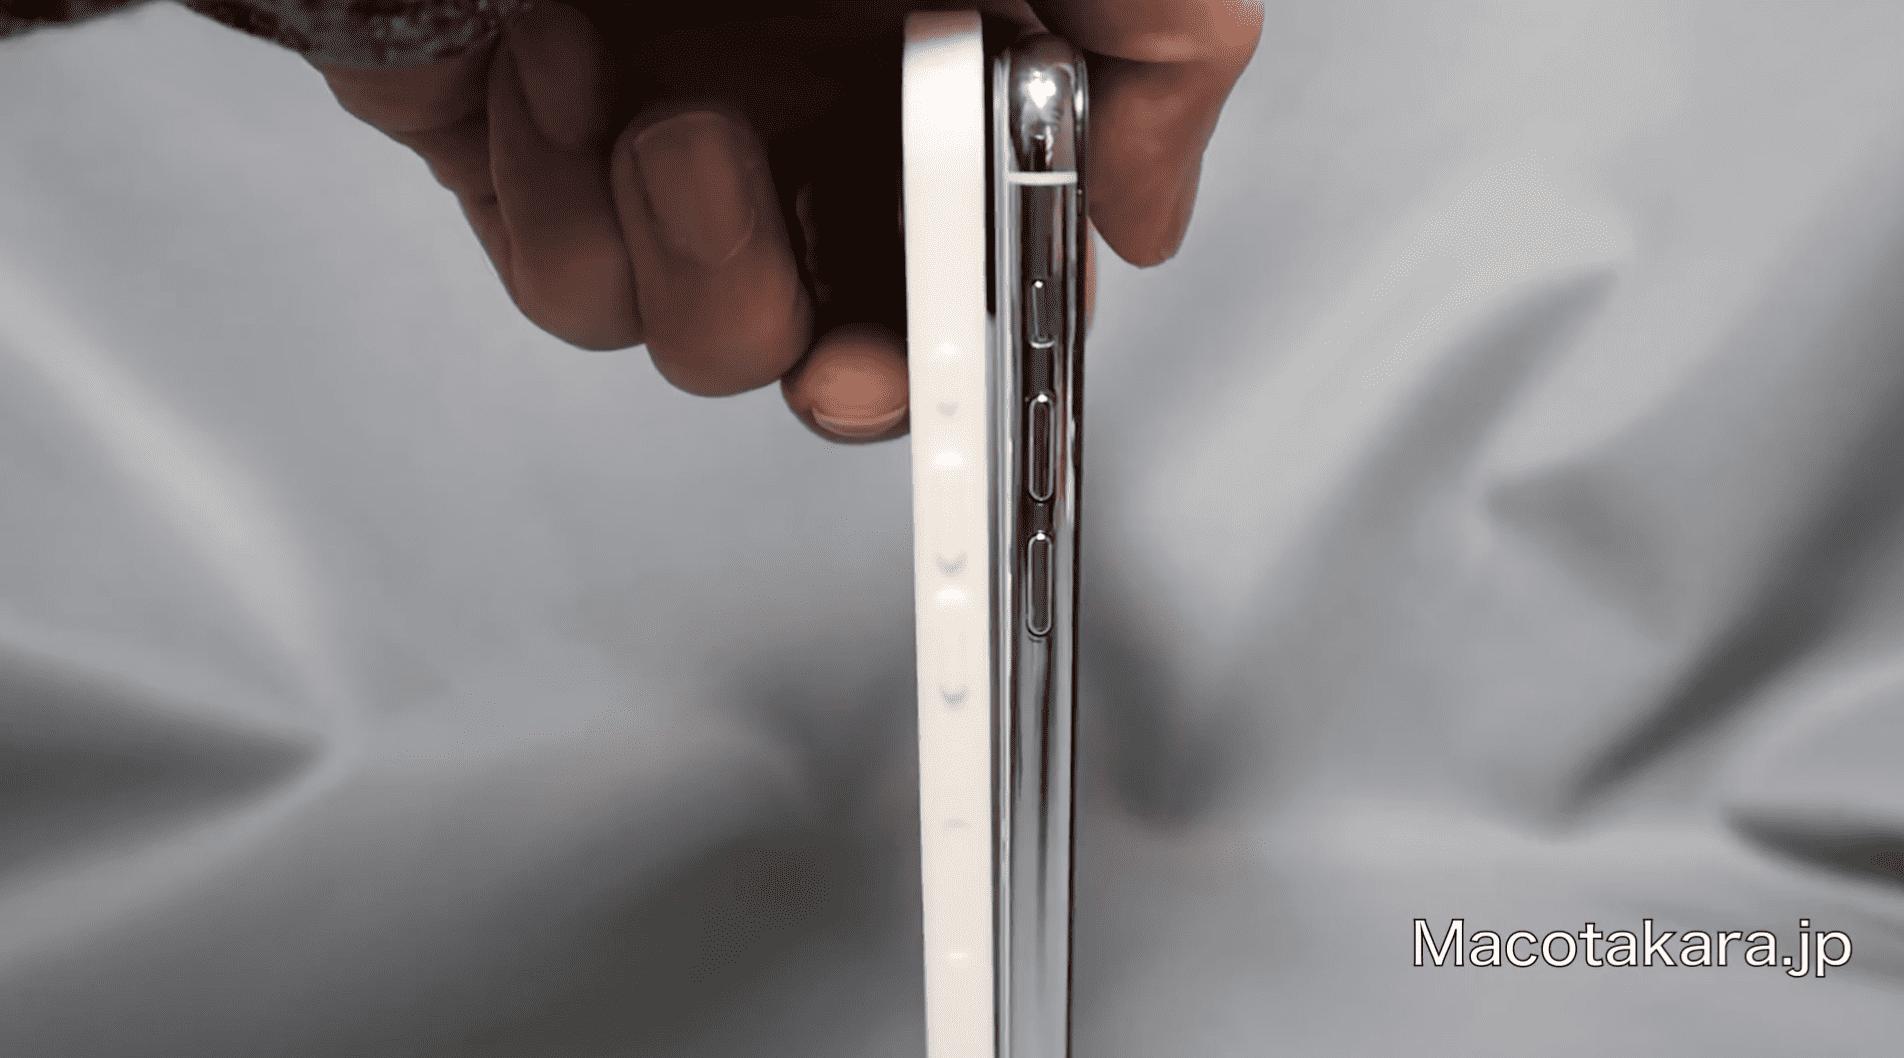 Macotaraka Iphone 12 Pro Max Mockup Preview Img 8